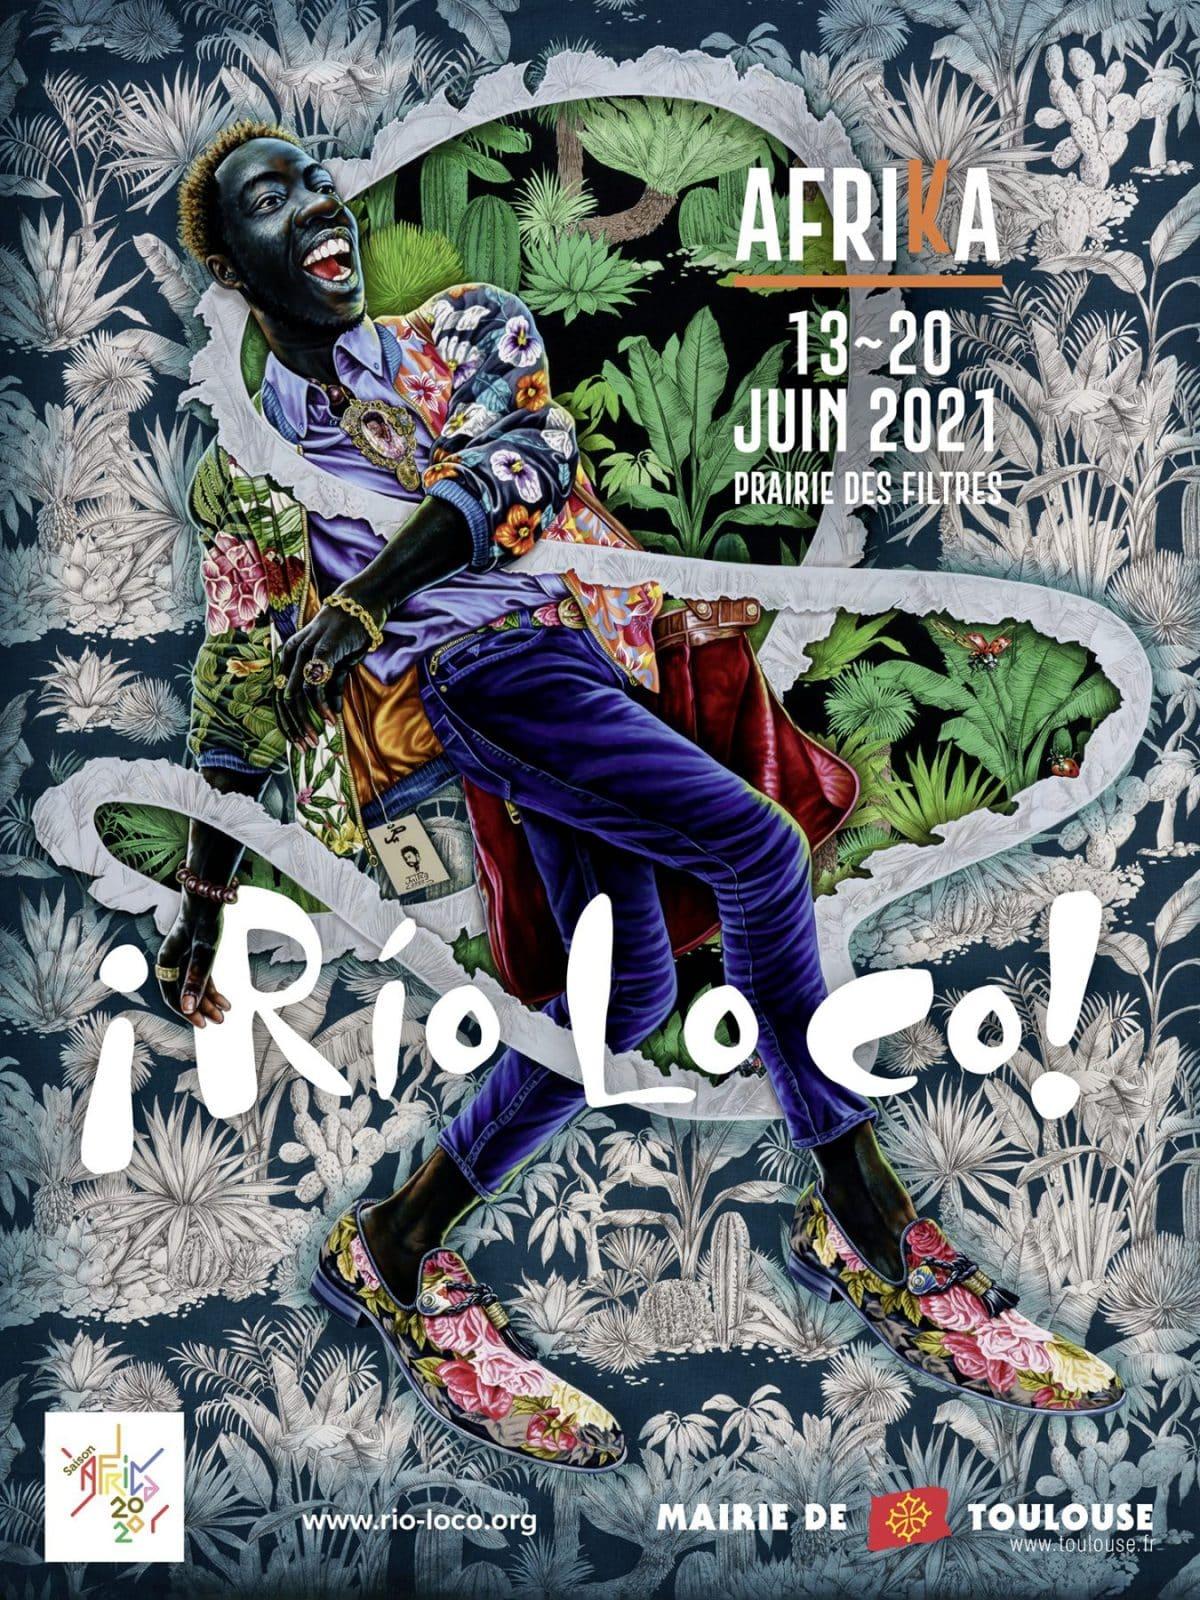 Rio Loco Afrika 2021